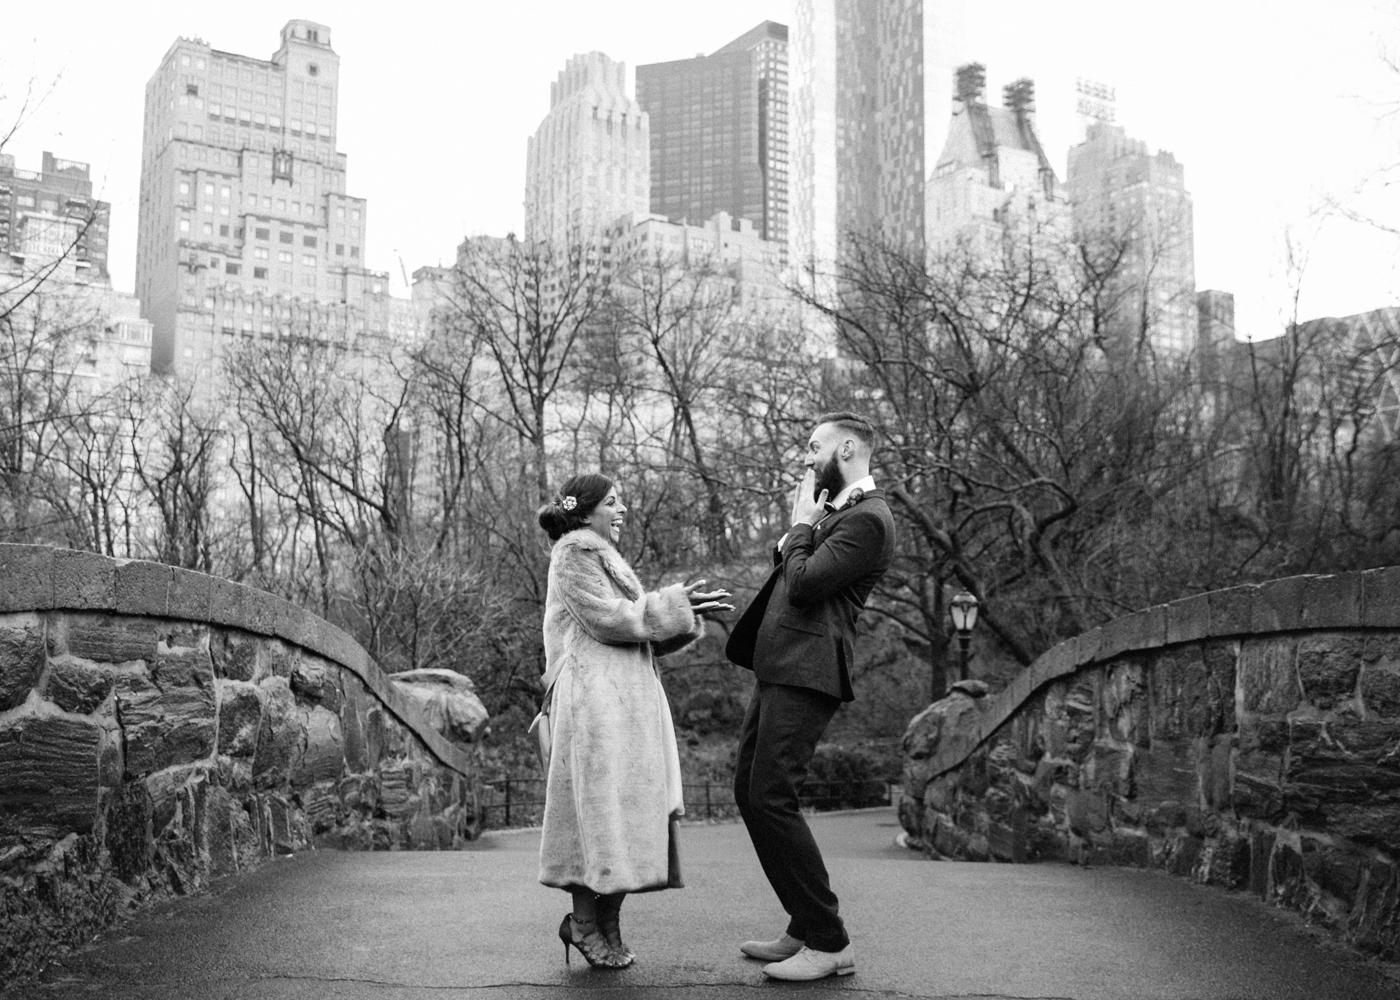 Central-park-wedding-by-Tanya-Isaeva-90.jpg